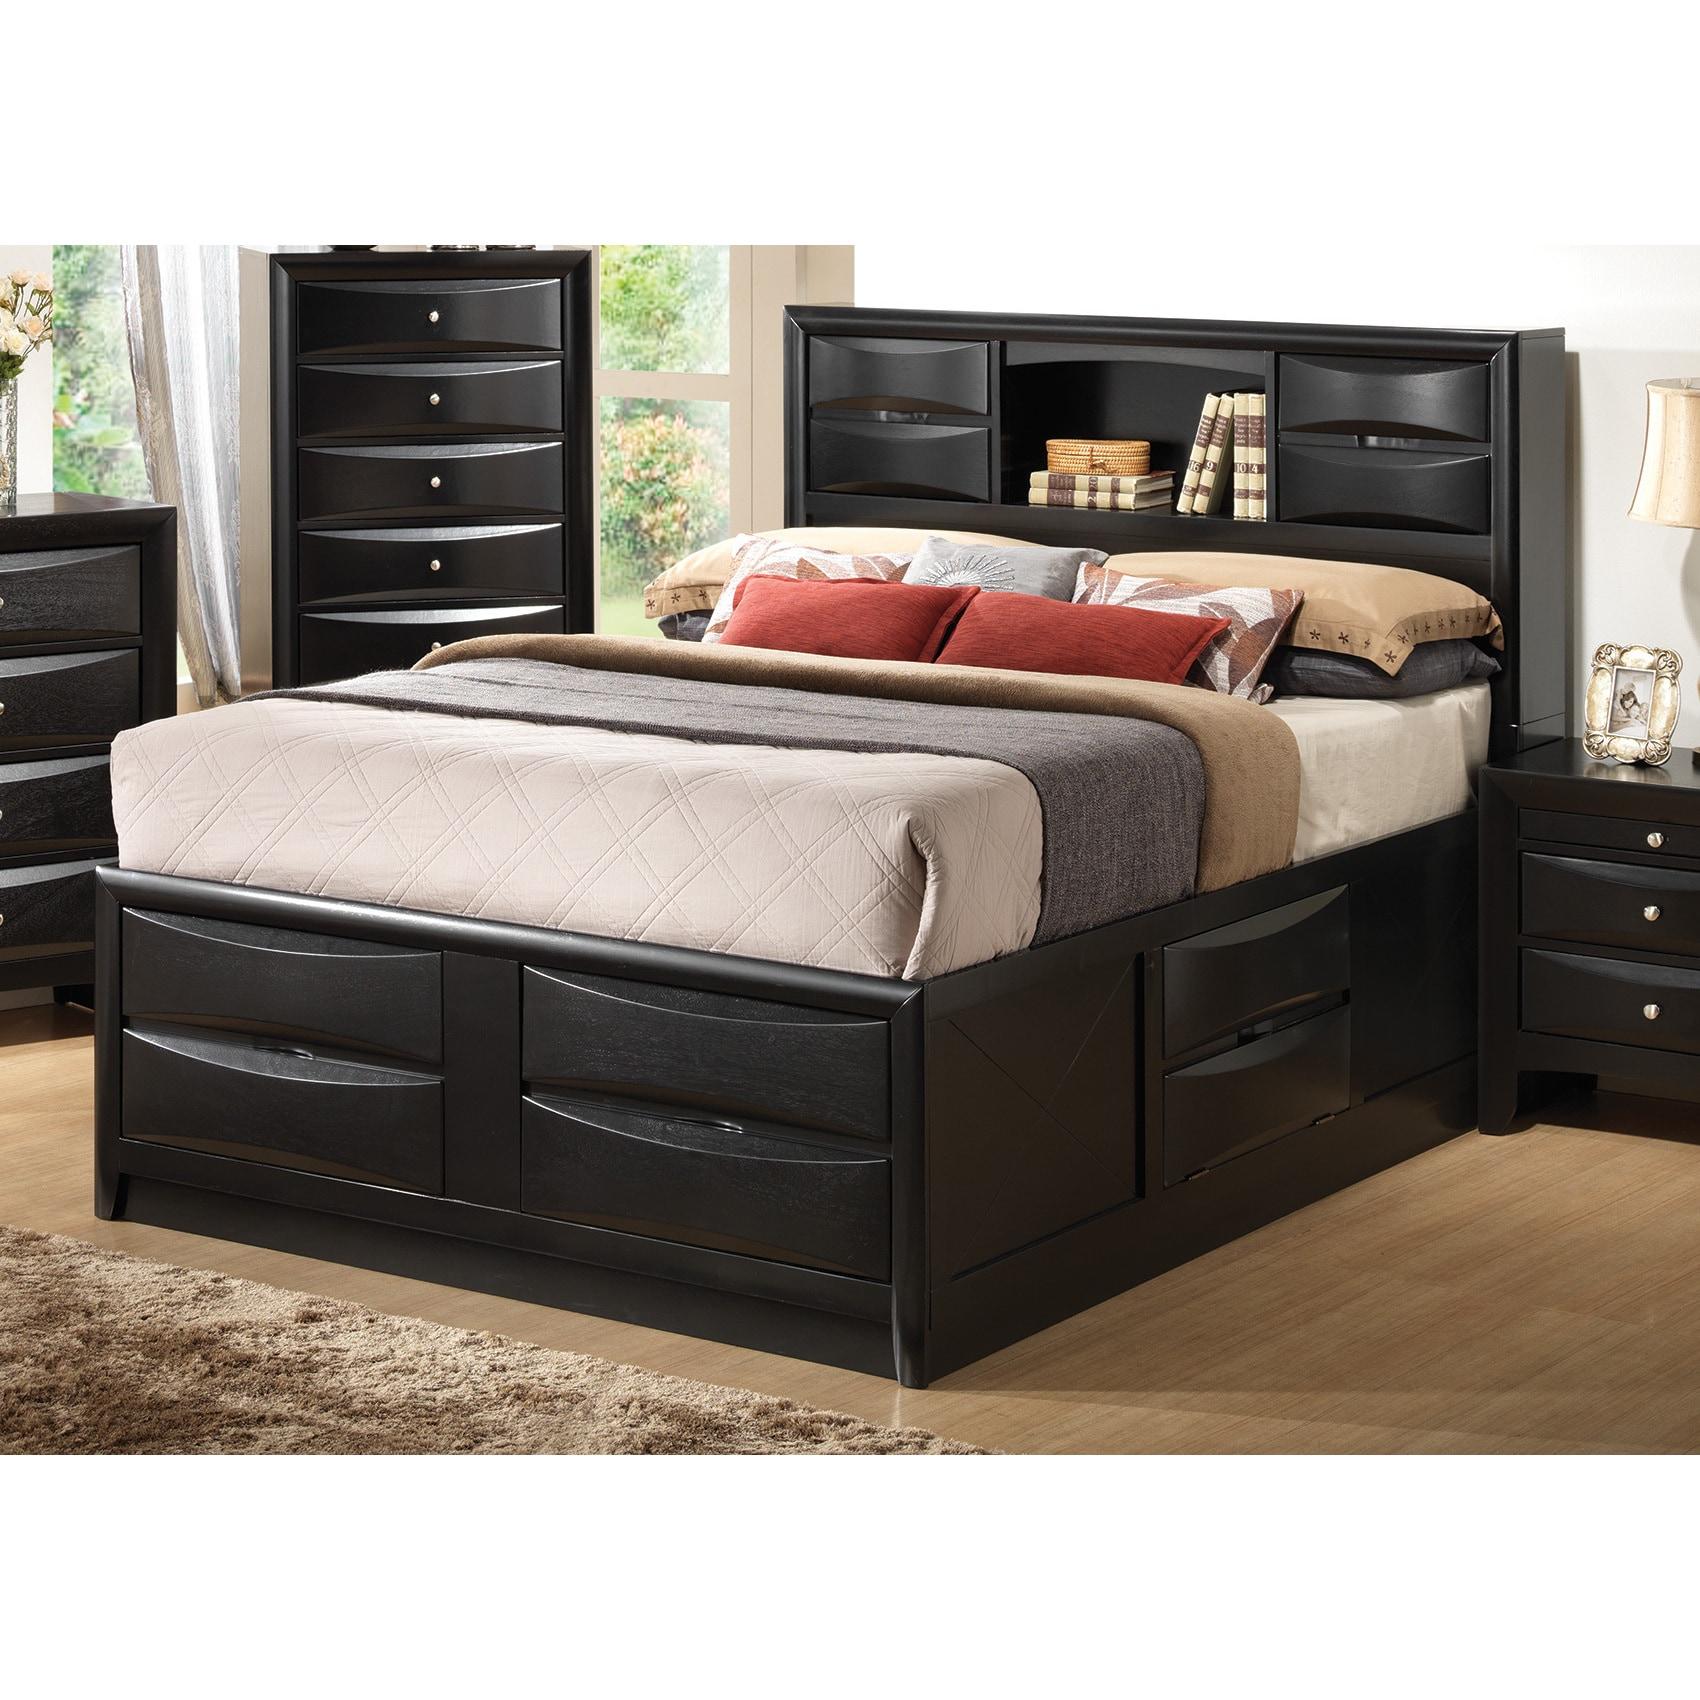 Coaster Furniture Briana Black Storage Bed (King)